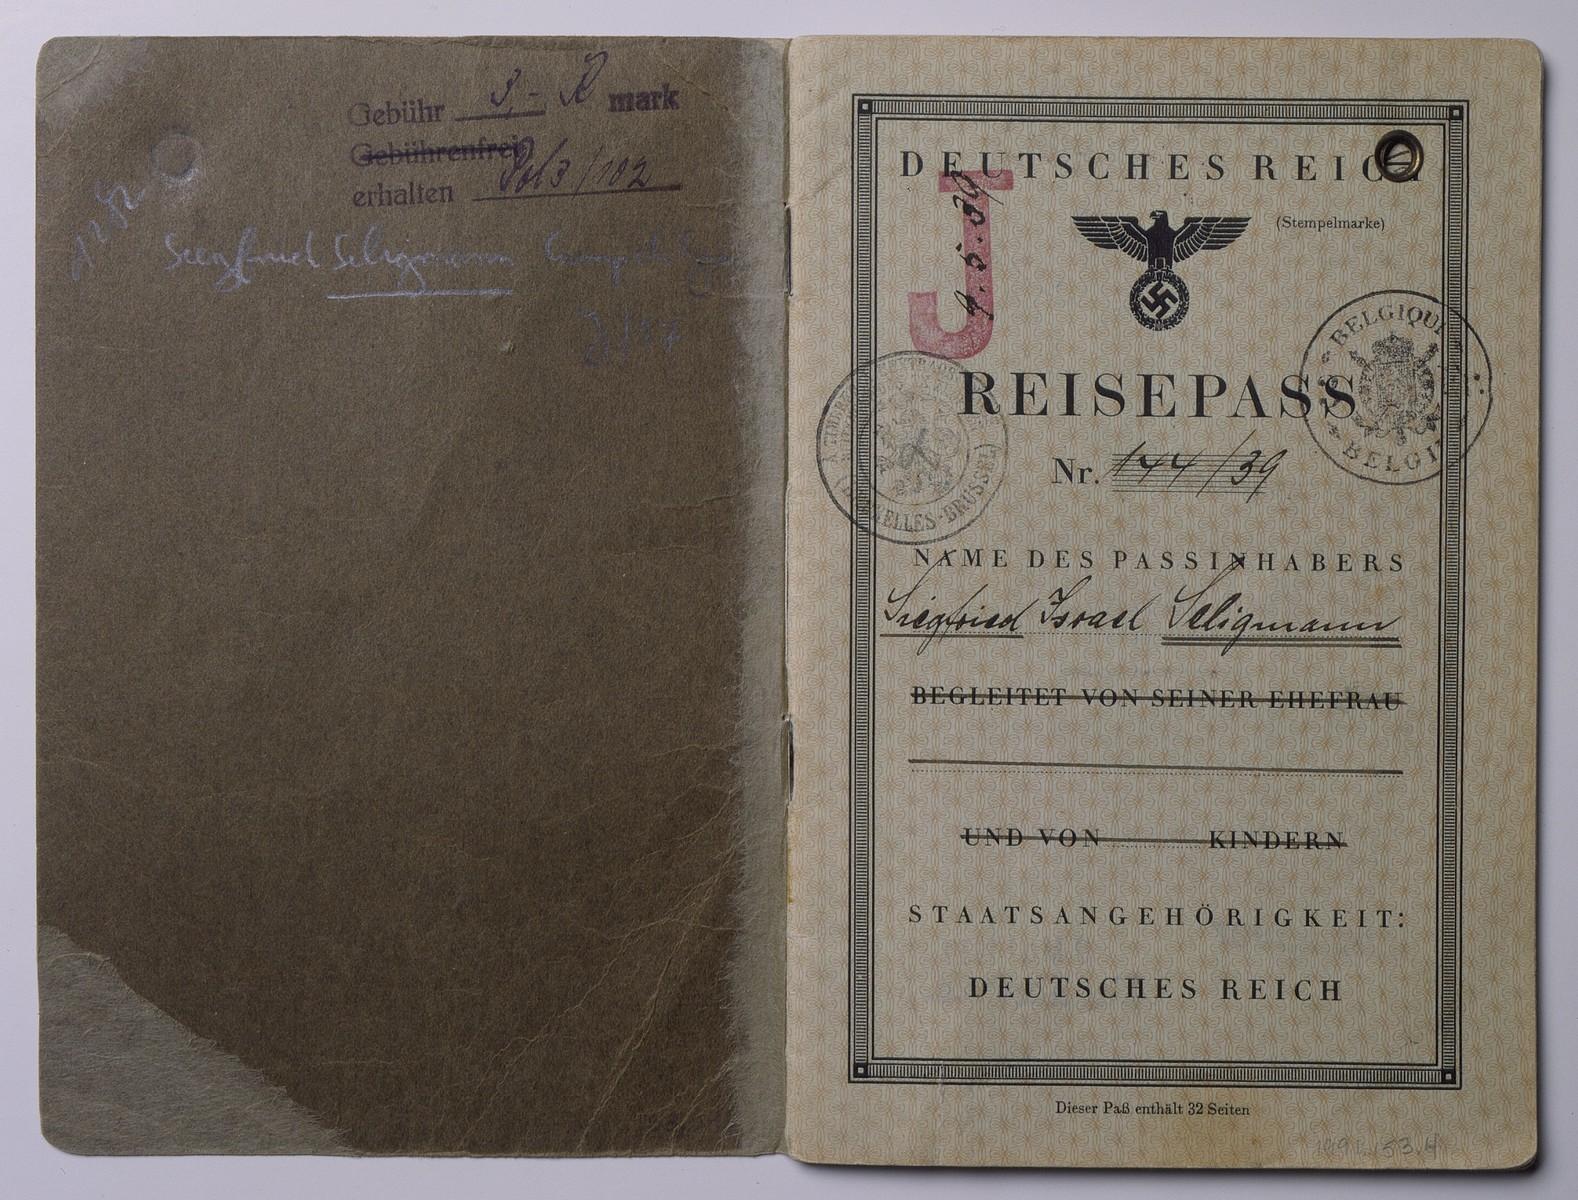 German passport for Siegfried Seligmann.